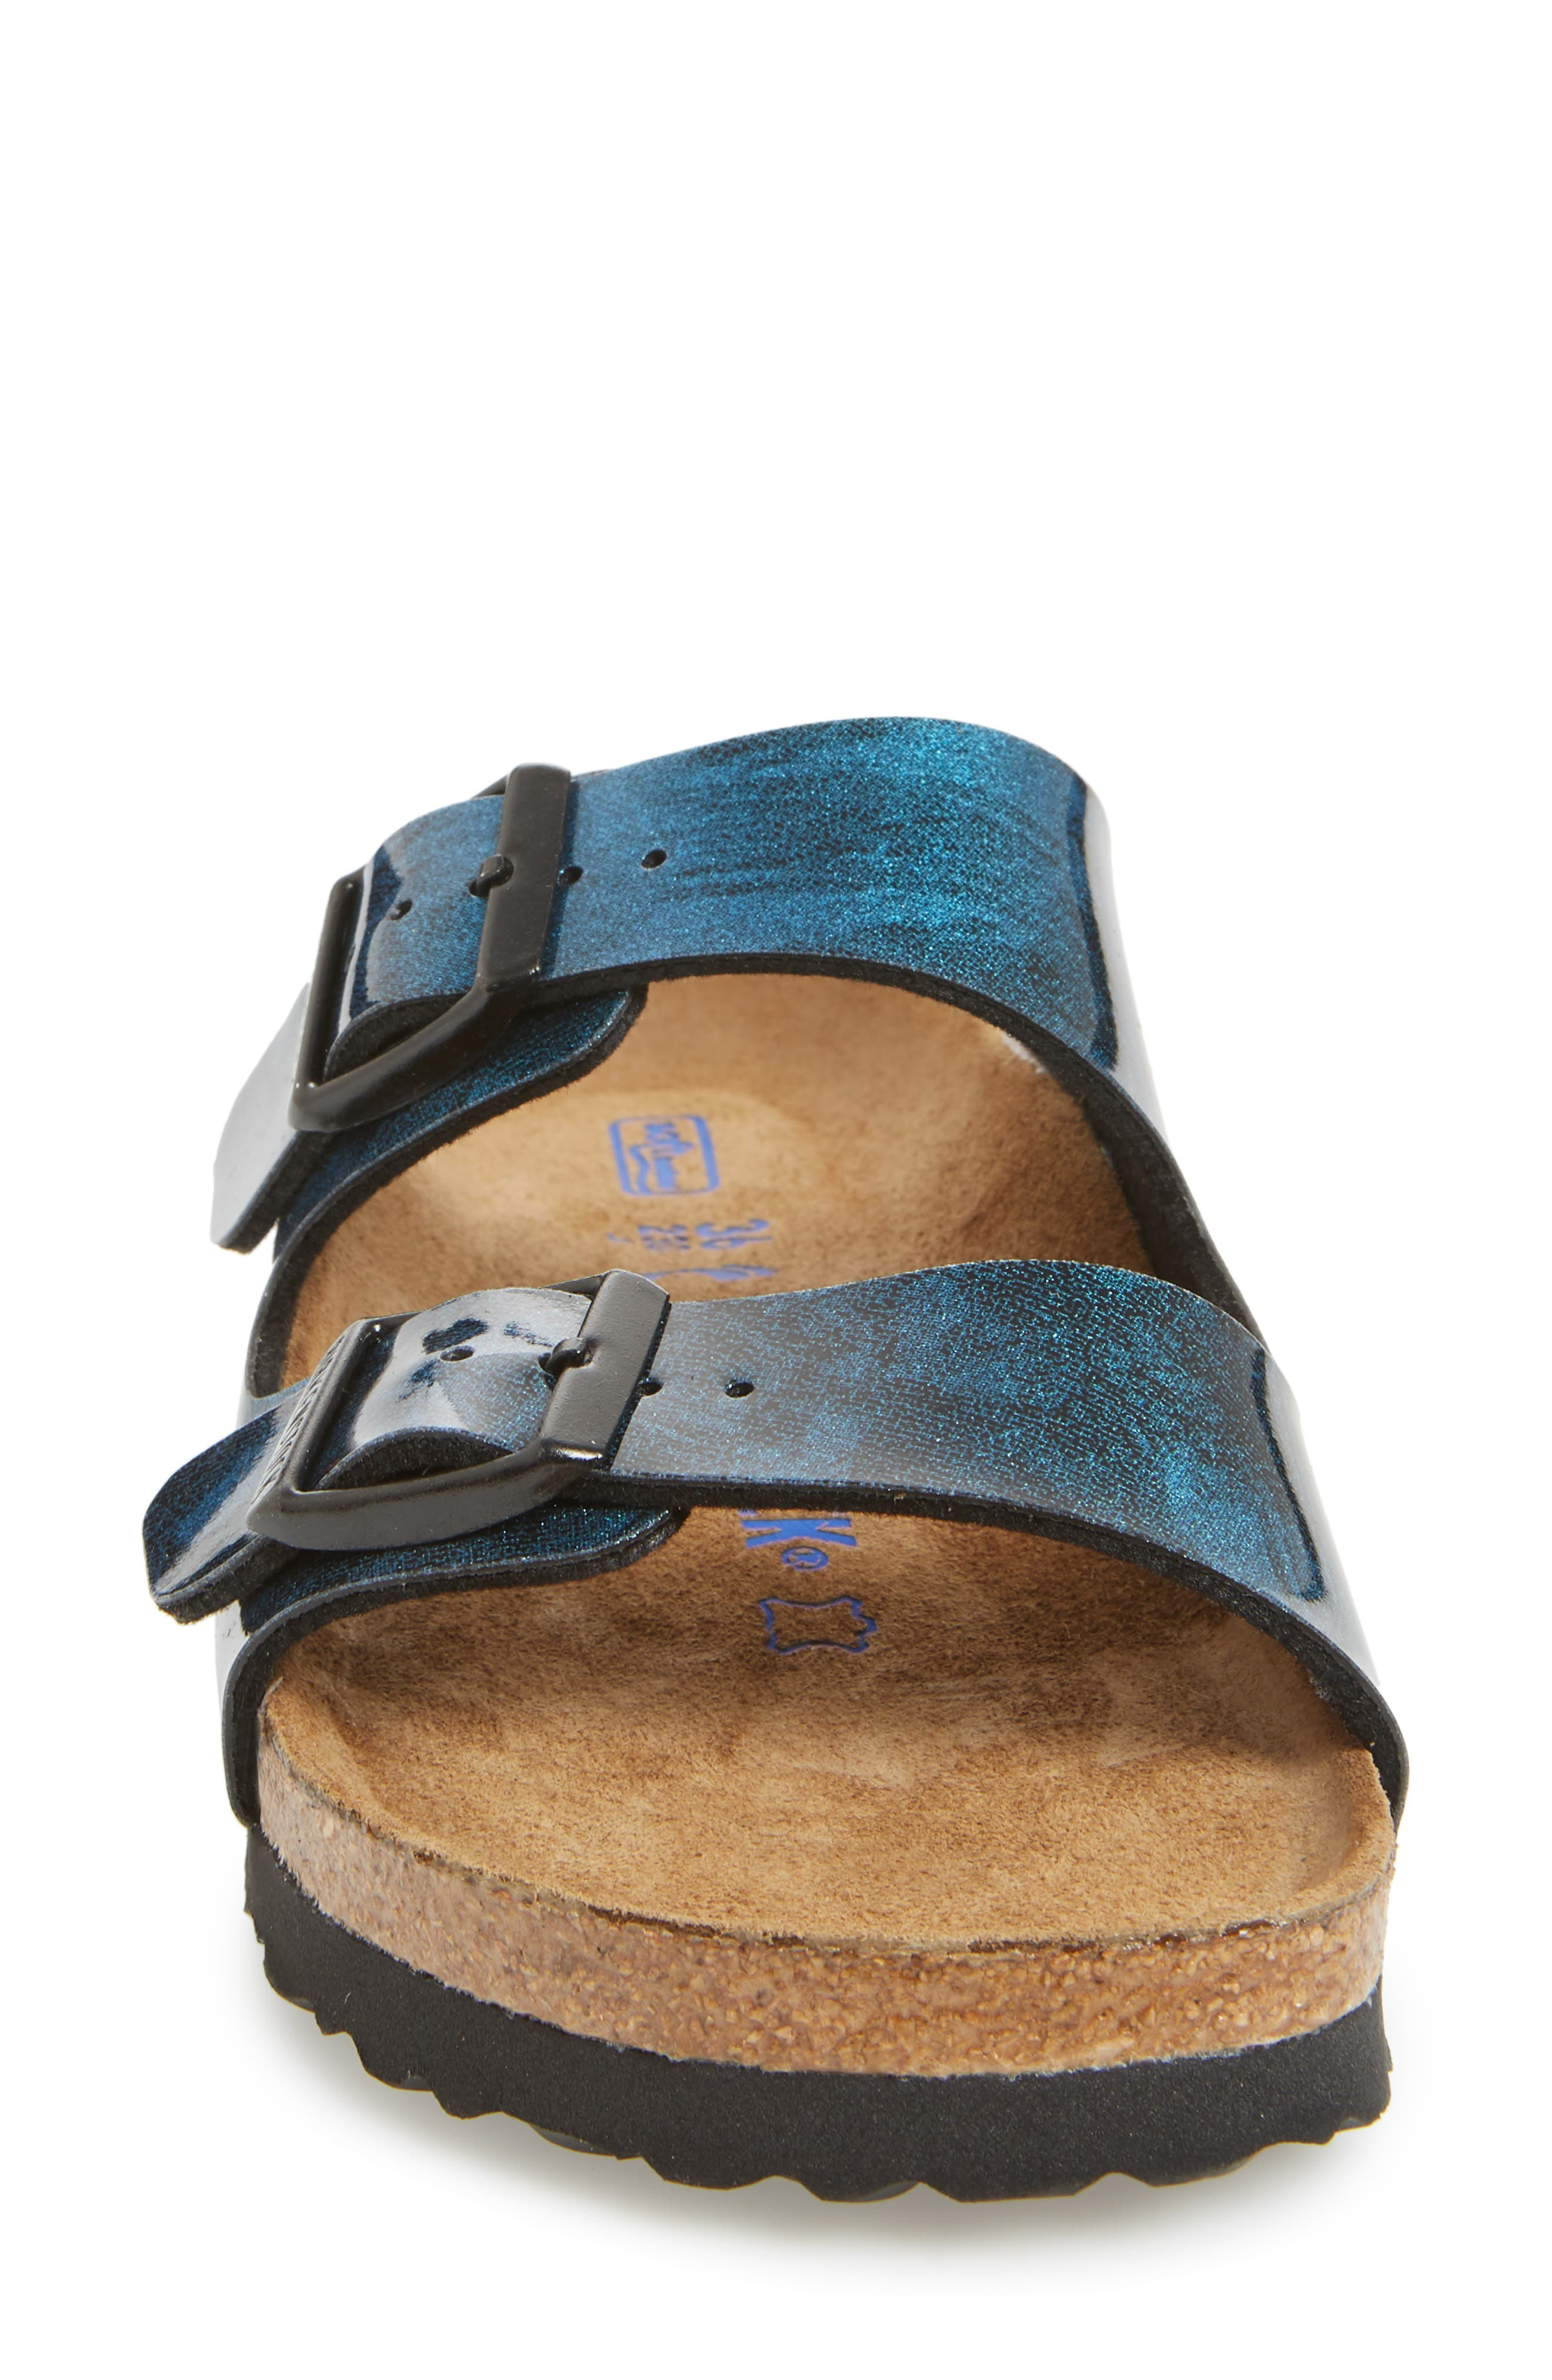 Arizona Birko-Flor Soft Footbed Sandal,                             Alternate thumbnail 4, color,                             MILKY WAY BLUE